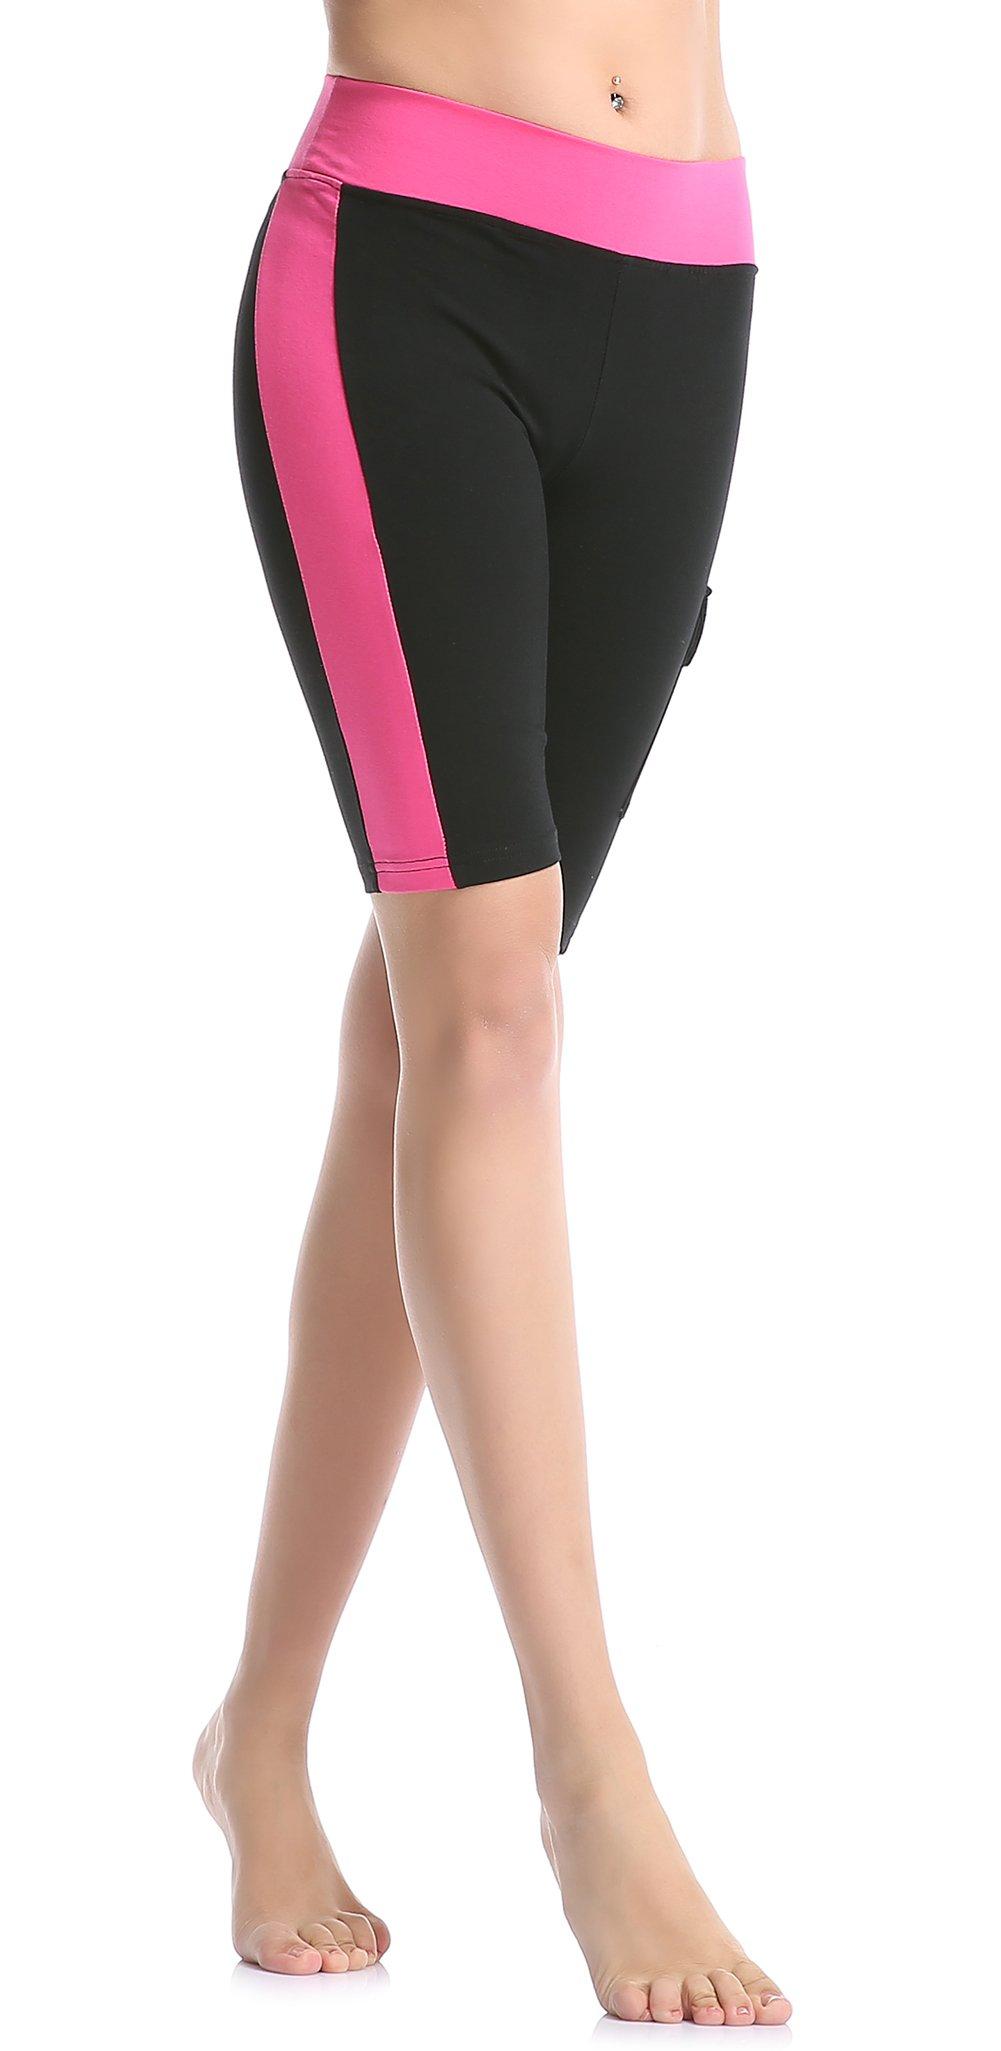 ABUSA Women's Cotton Workout Bike Yoga Shorts - Tummy Control S Rose Red by ABUSA